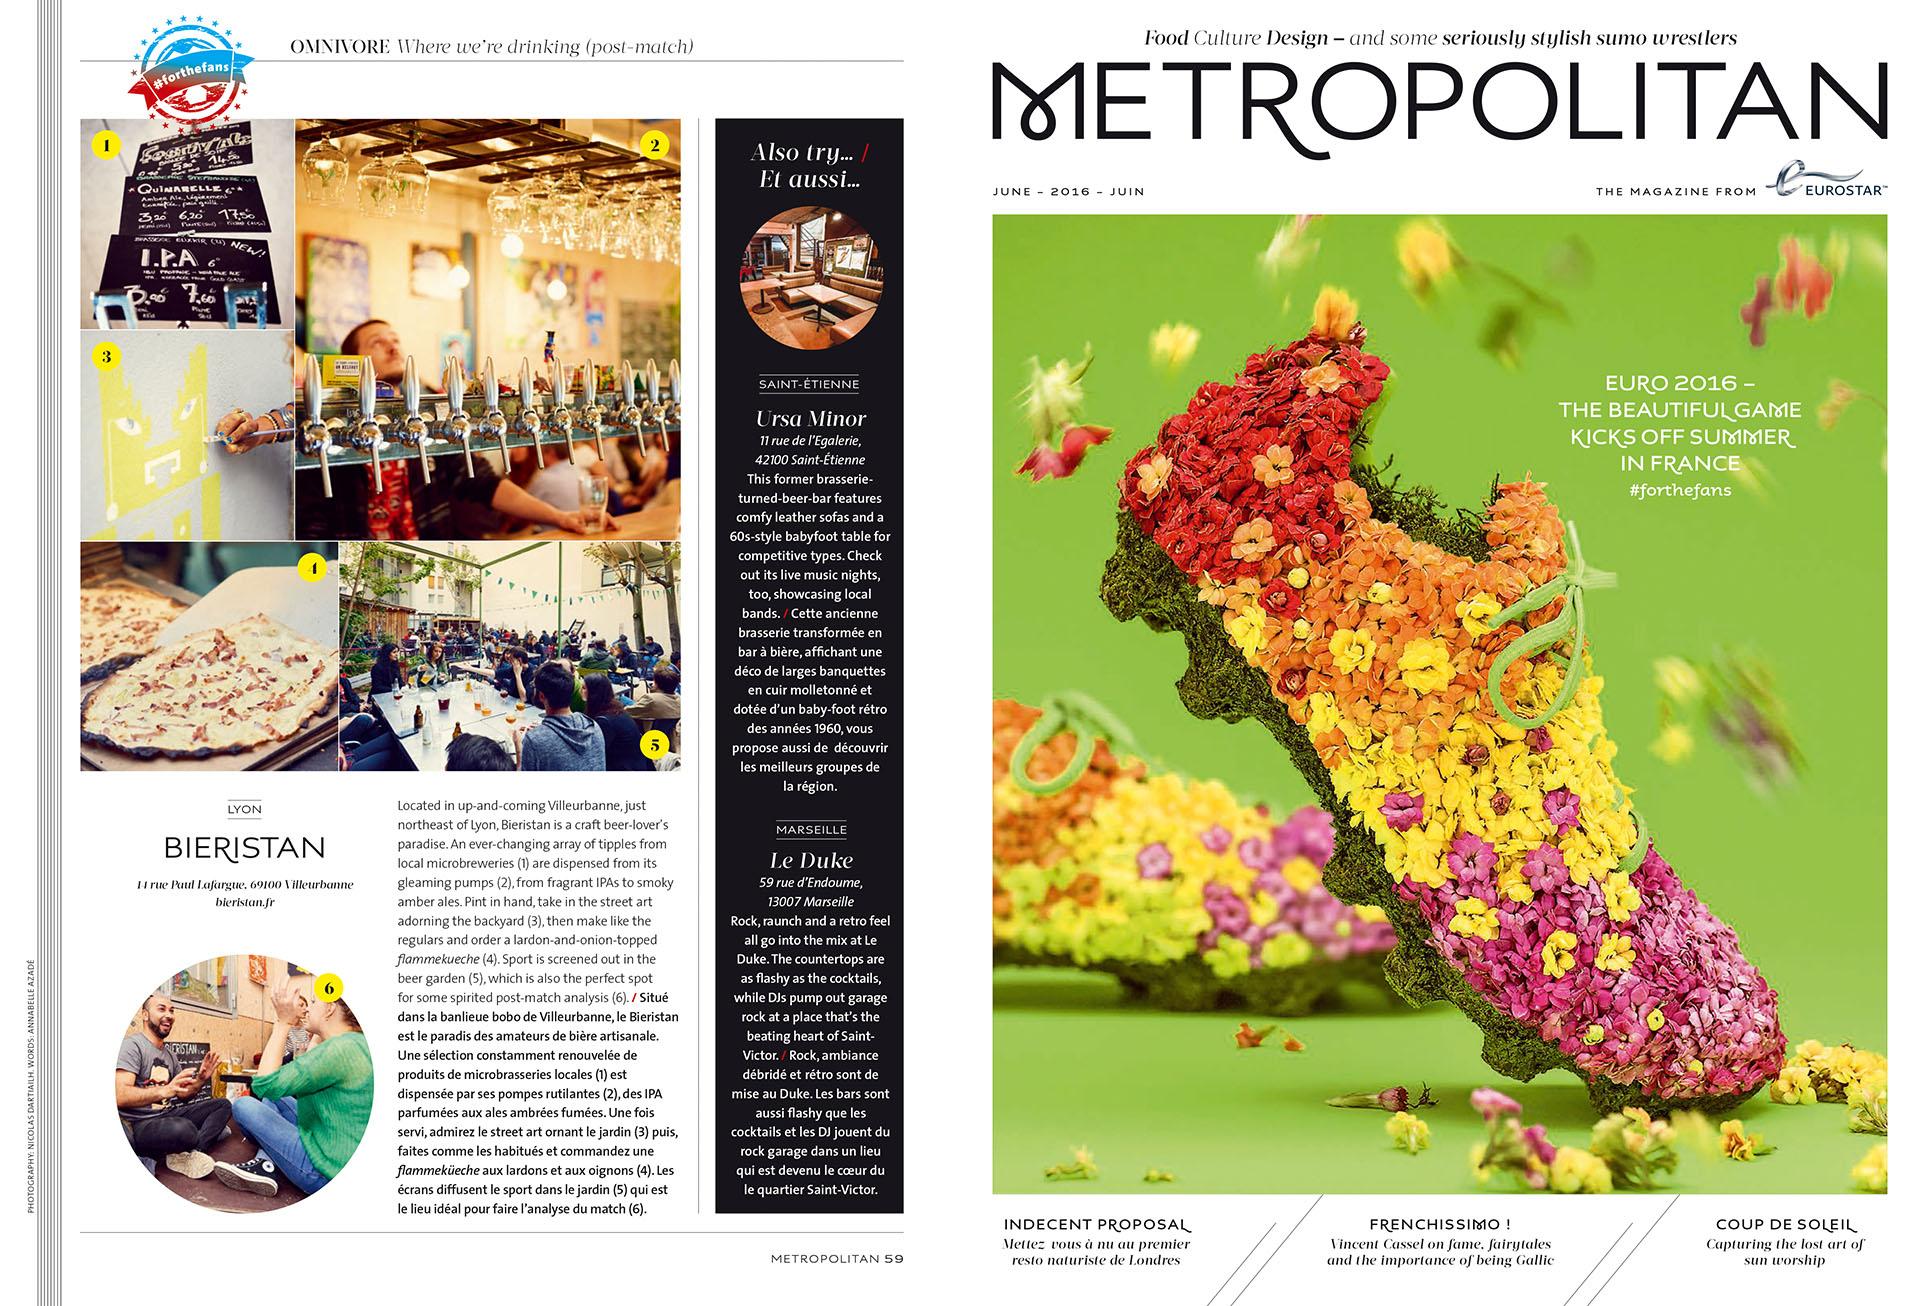 Eurostar Magazine - Metropolitan - Where we're drinking - Juin 2016